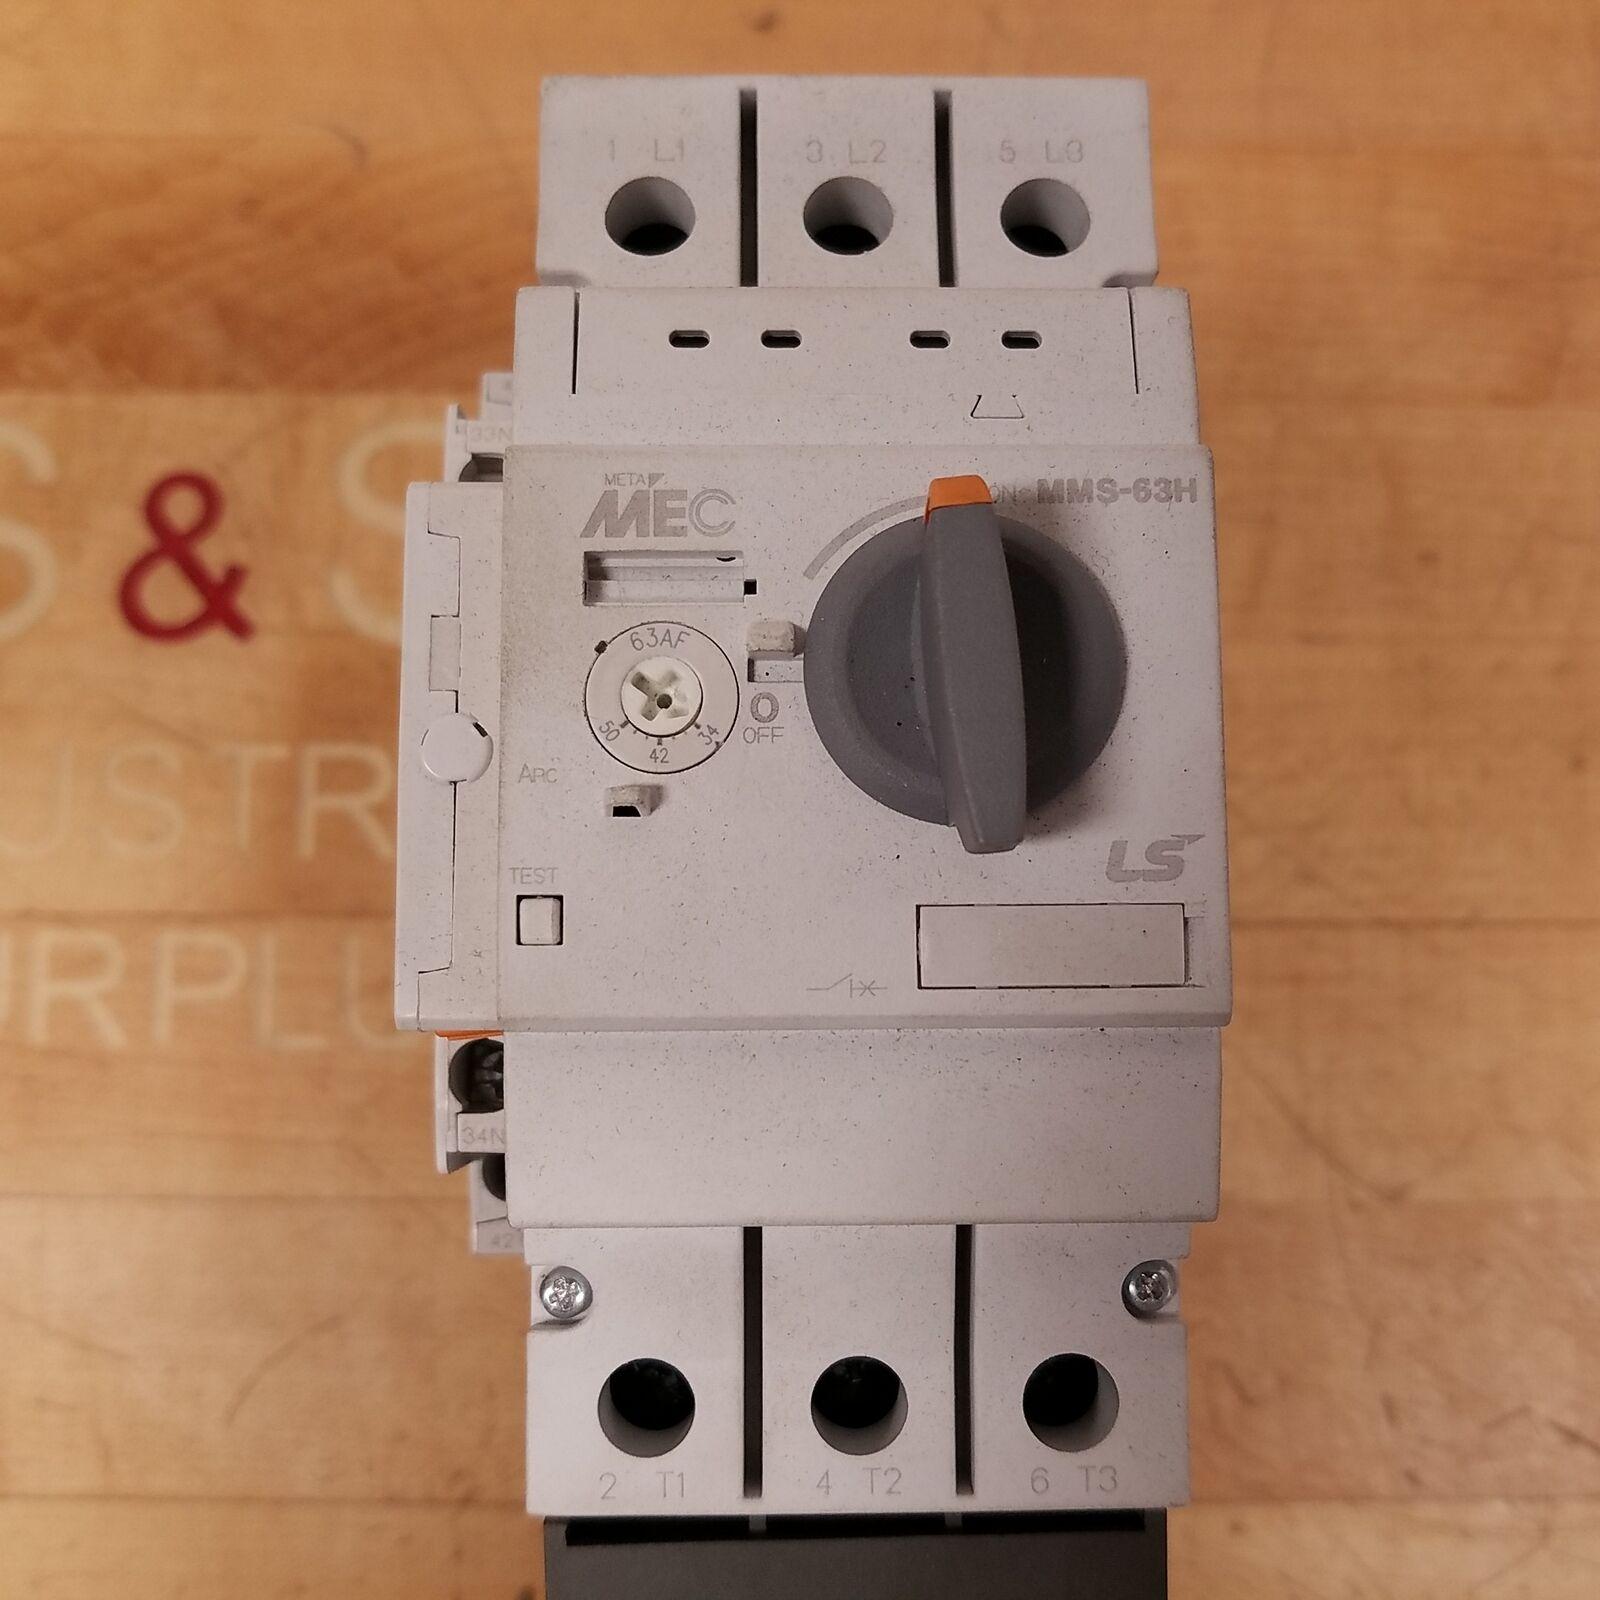 NIB MEC MMS-32H MMS-32H-8A enclosed manual motor starter 5-8A EPH32-65S